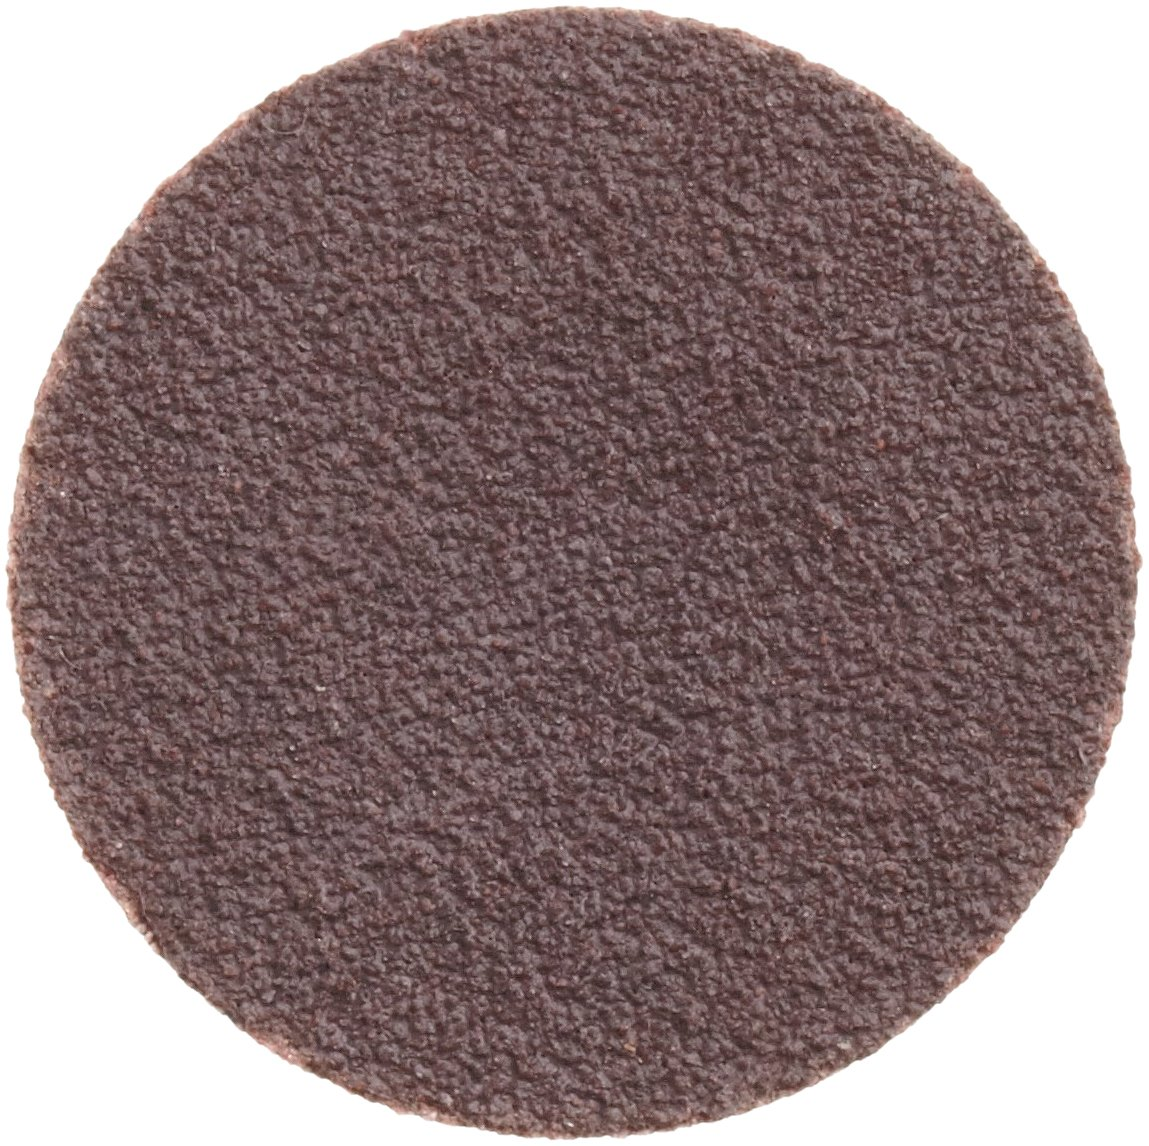 Norton R228 Metalite Speed-Lok Abrasive Disc, Cloth Backing, TS, Aluminum Oxide, 2'' Diameter, Grit 120   (Pack of 100) by Norton Abrasives - St. Gobain